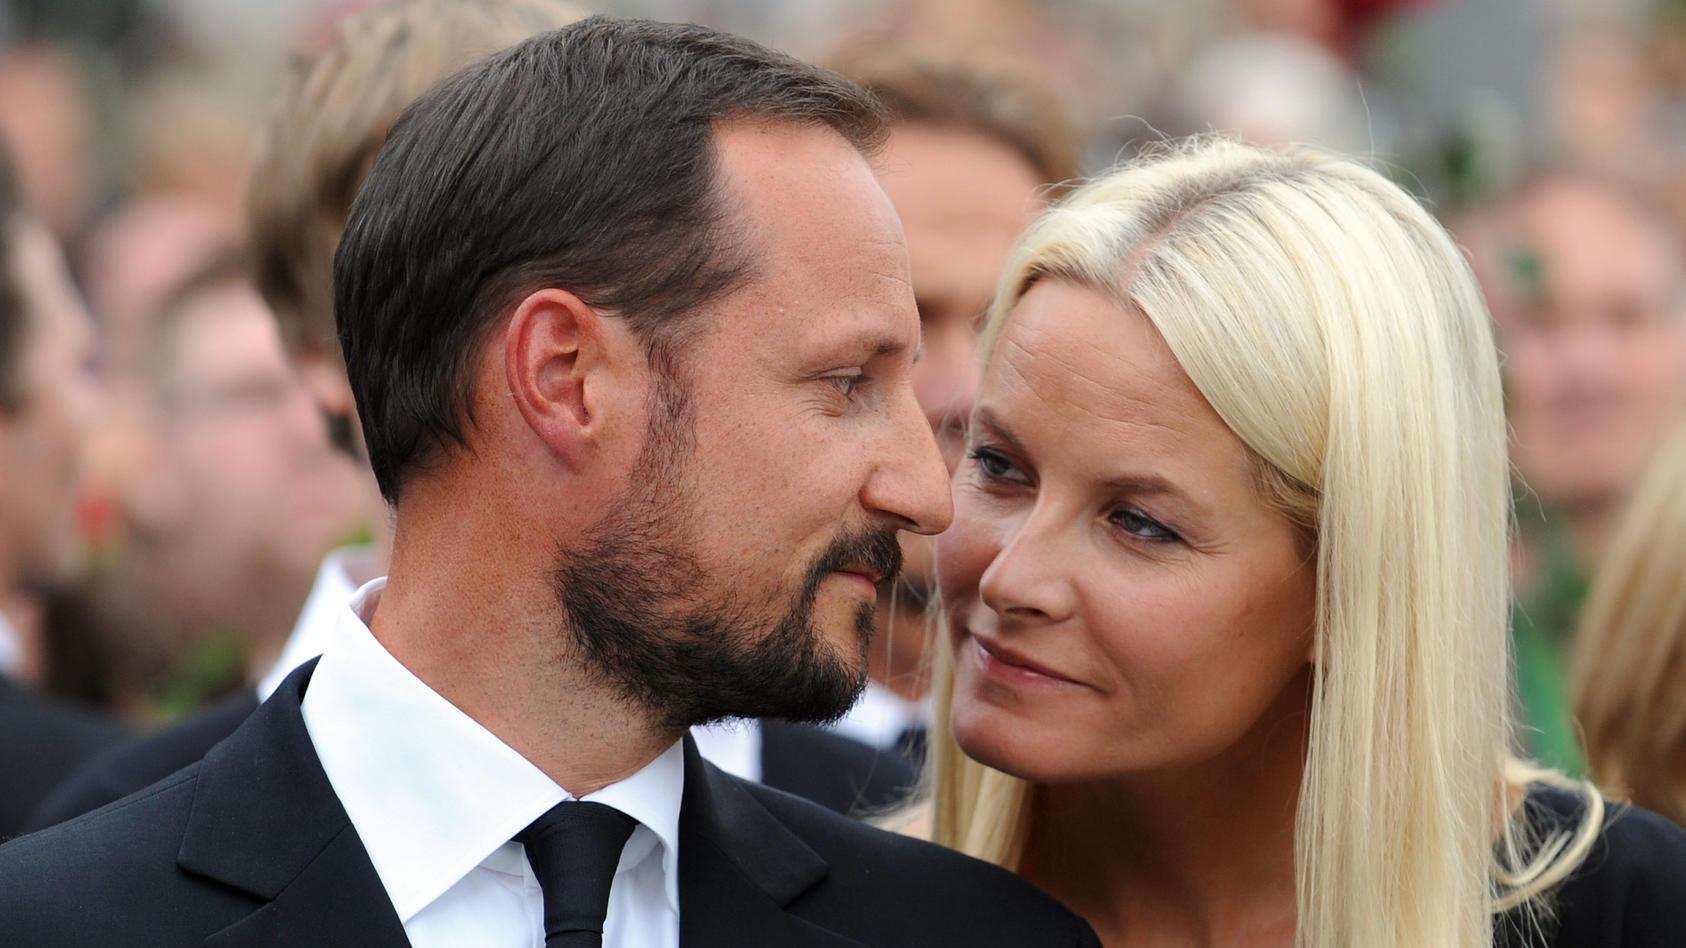 Kronprinzenpaar Haakon und Mette-Marit